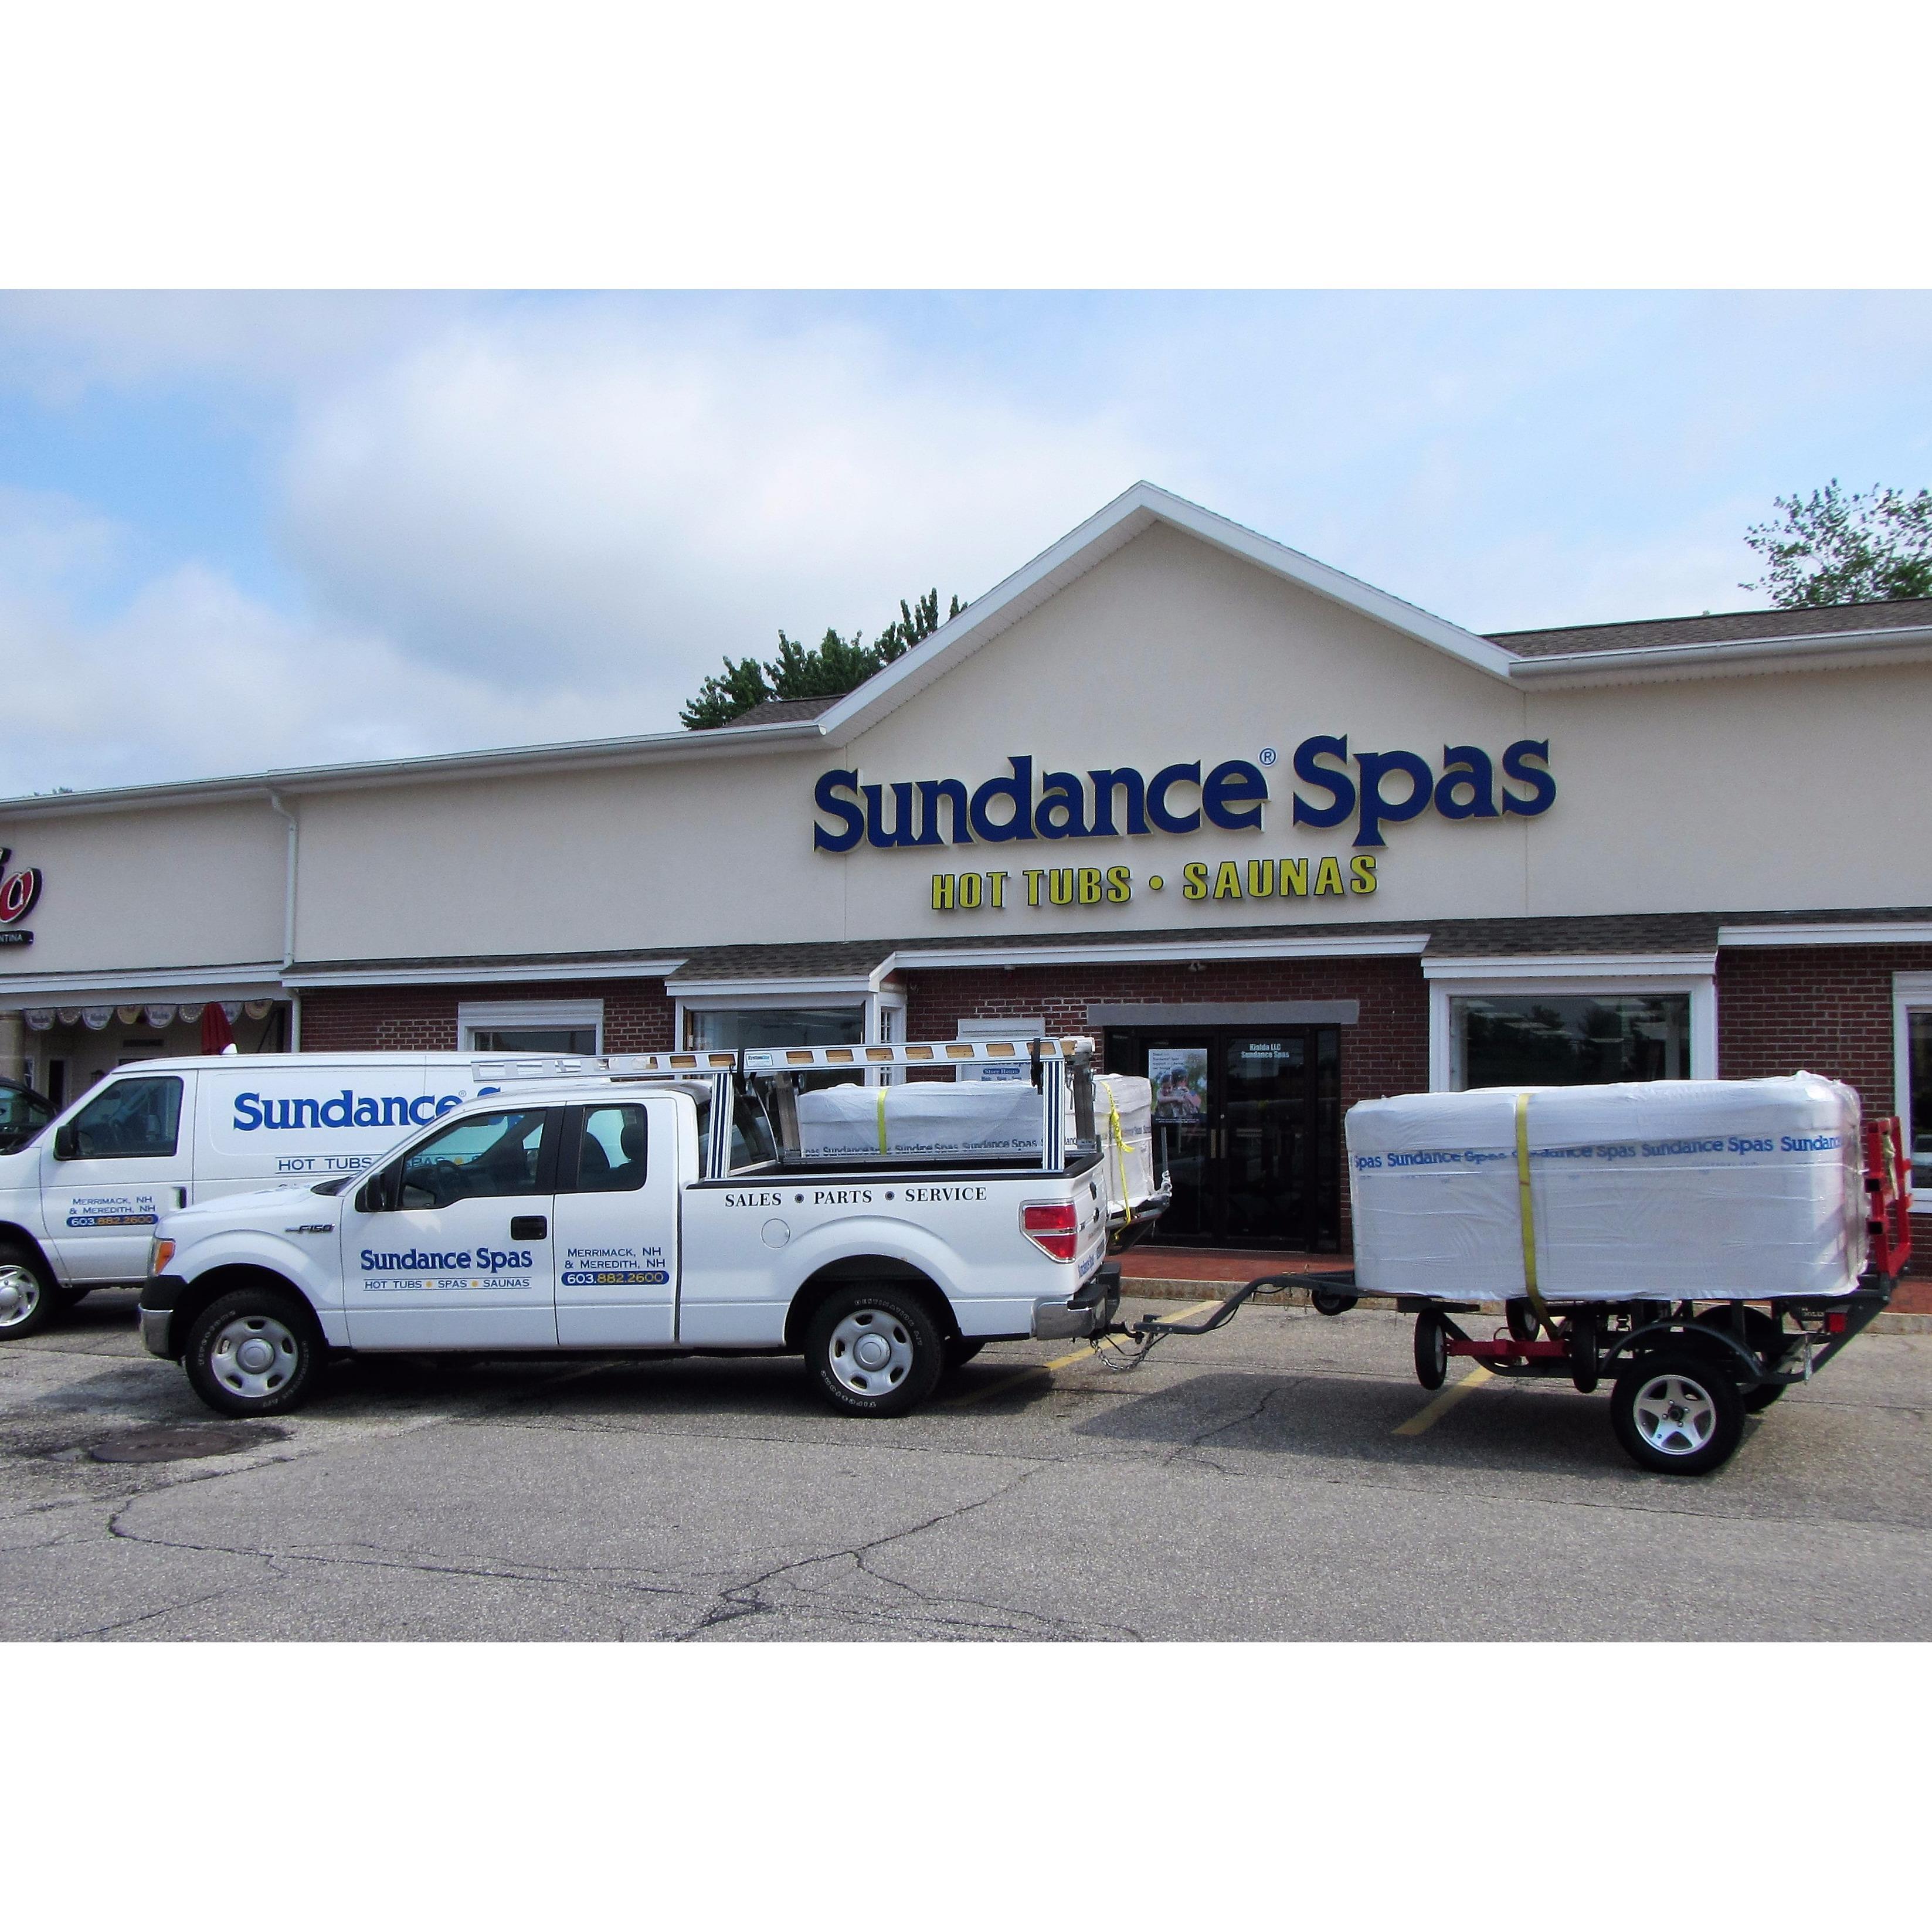 Sundance Spas Milford >> Sundance Spas - Merrimack, NH - Business Directory